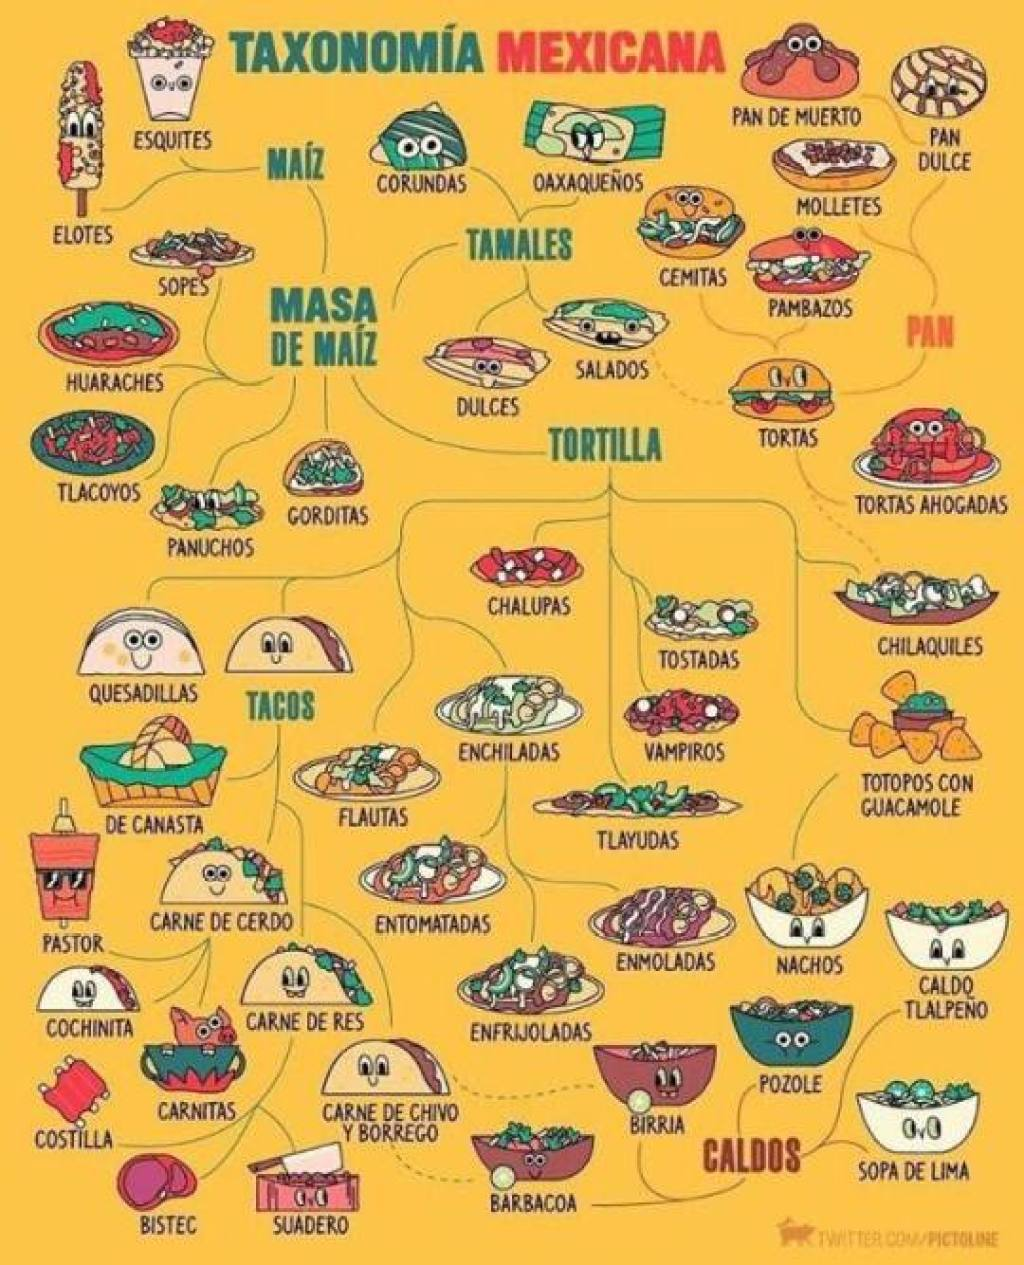 Taxonomy Mexicana